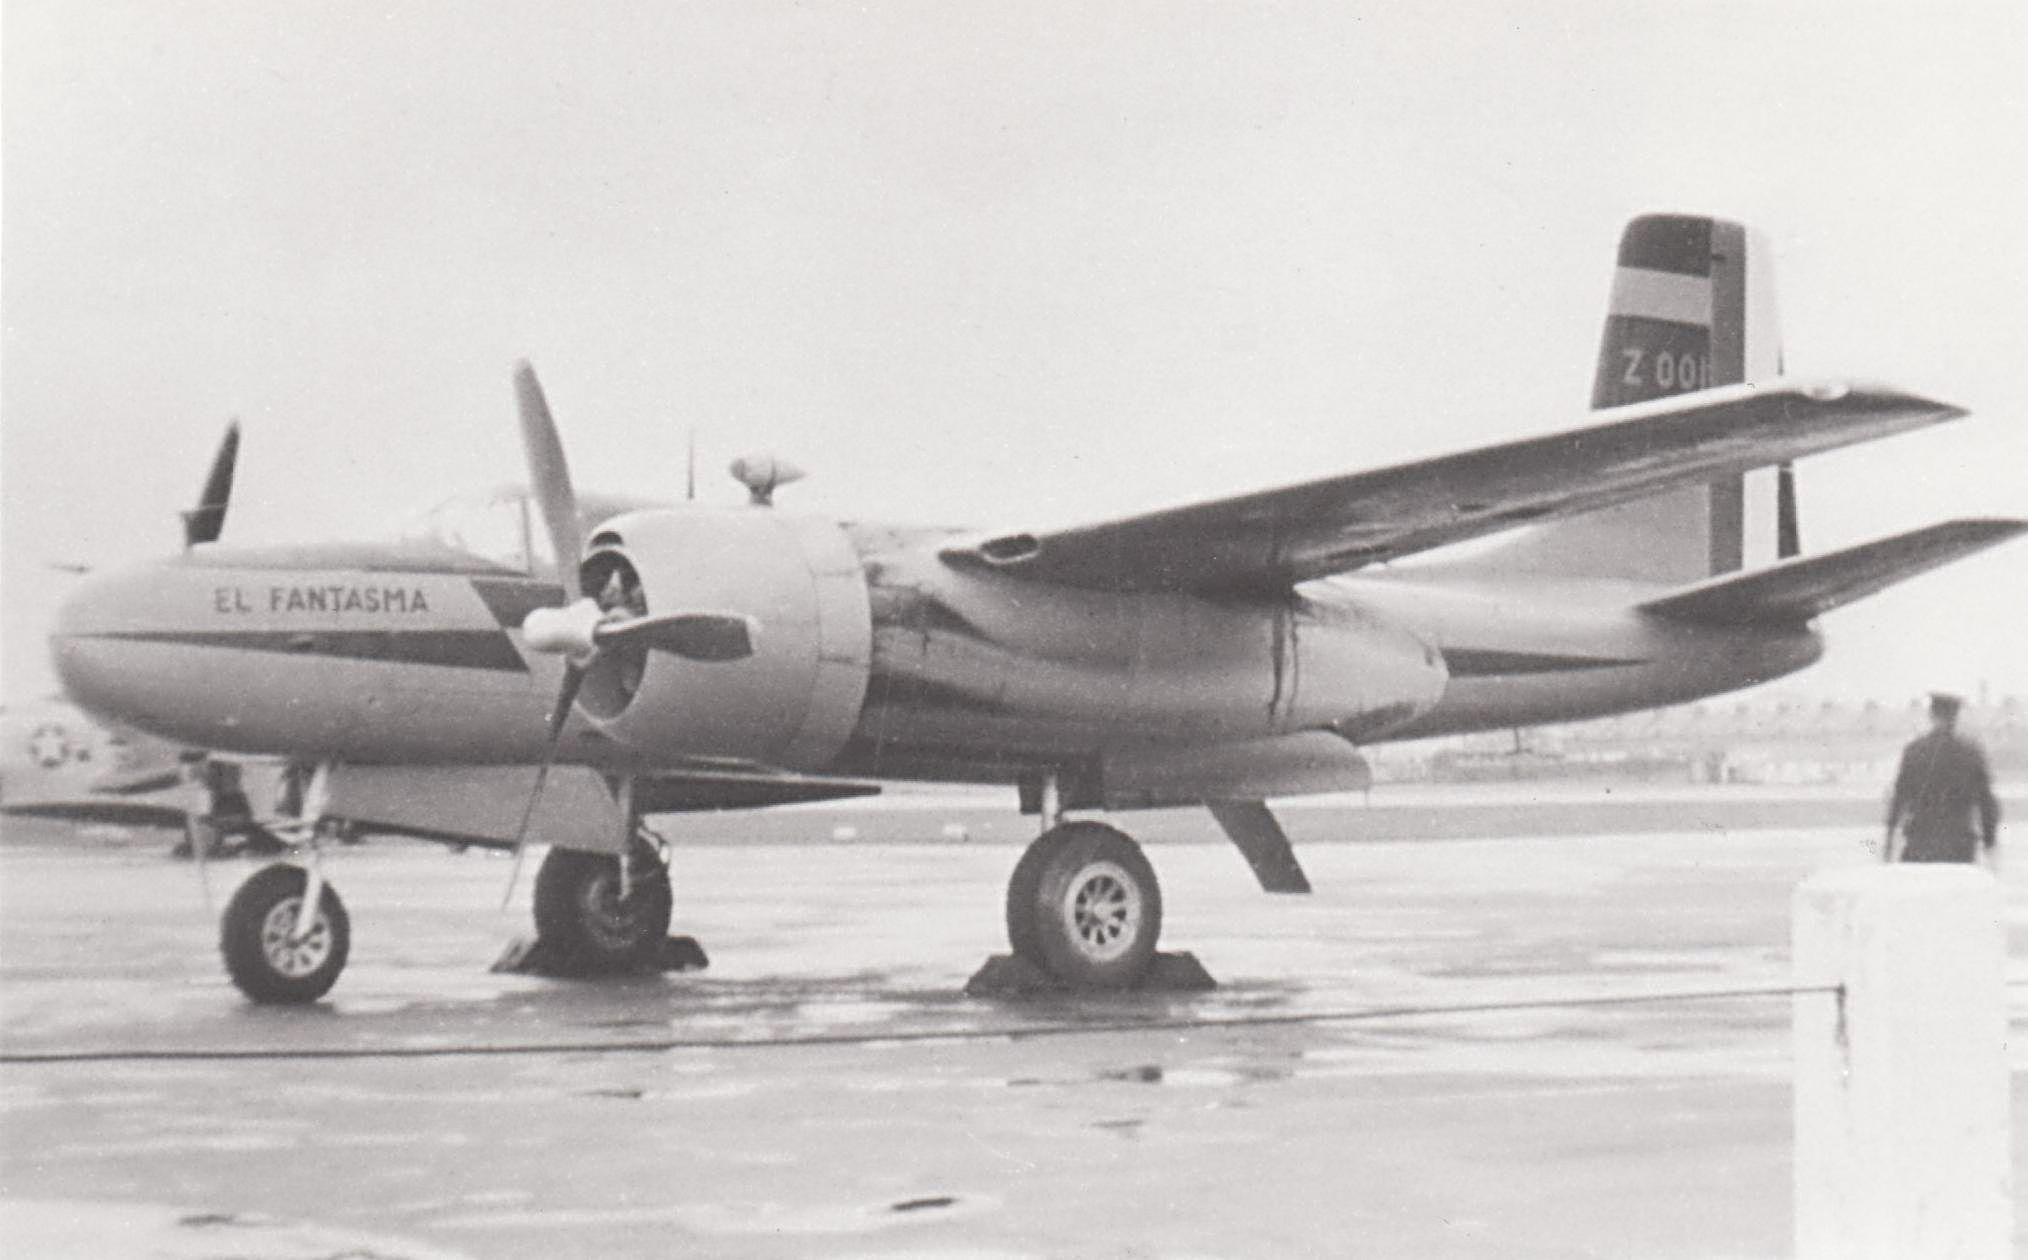 B-26 en Servicio de la FAM: Vectarisletter